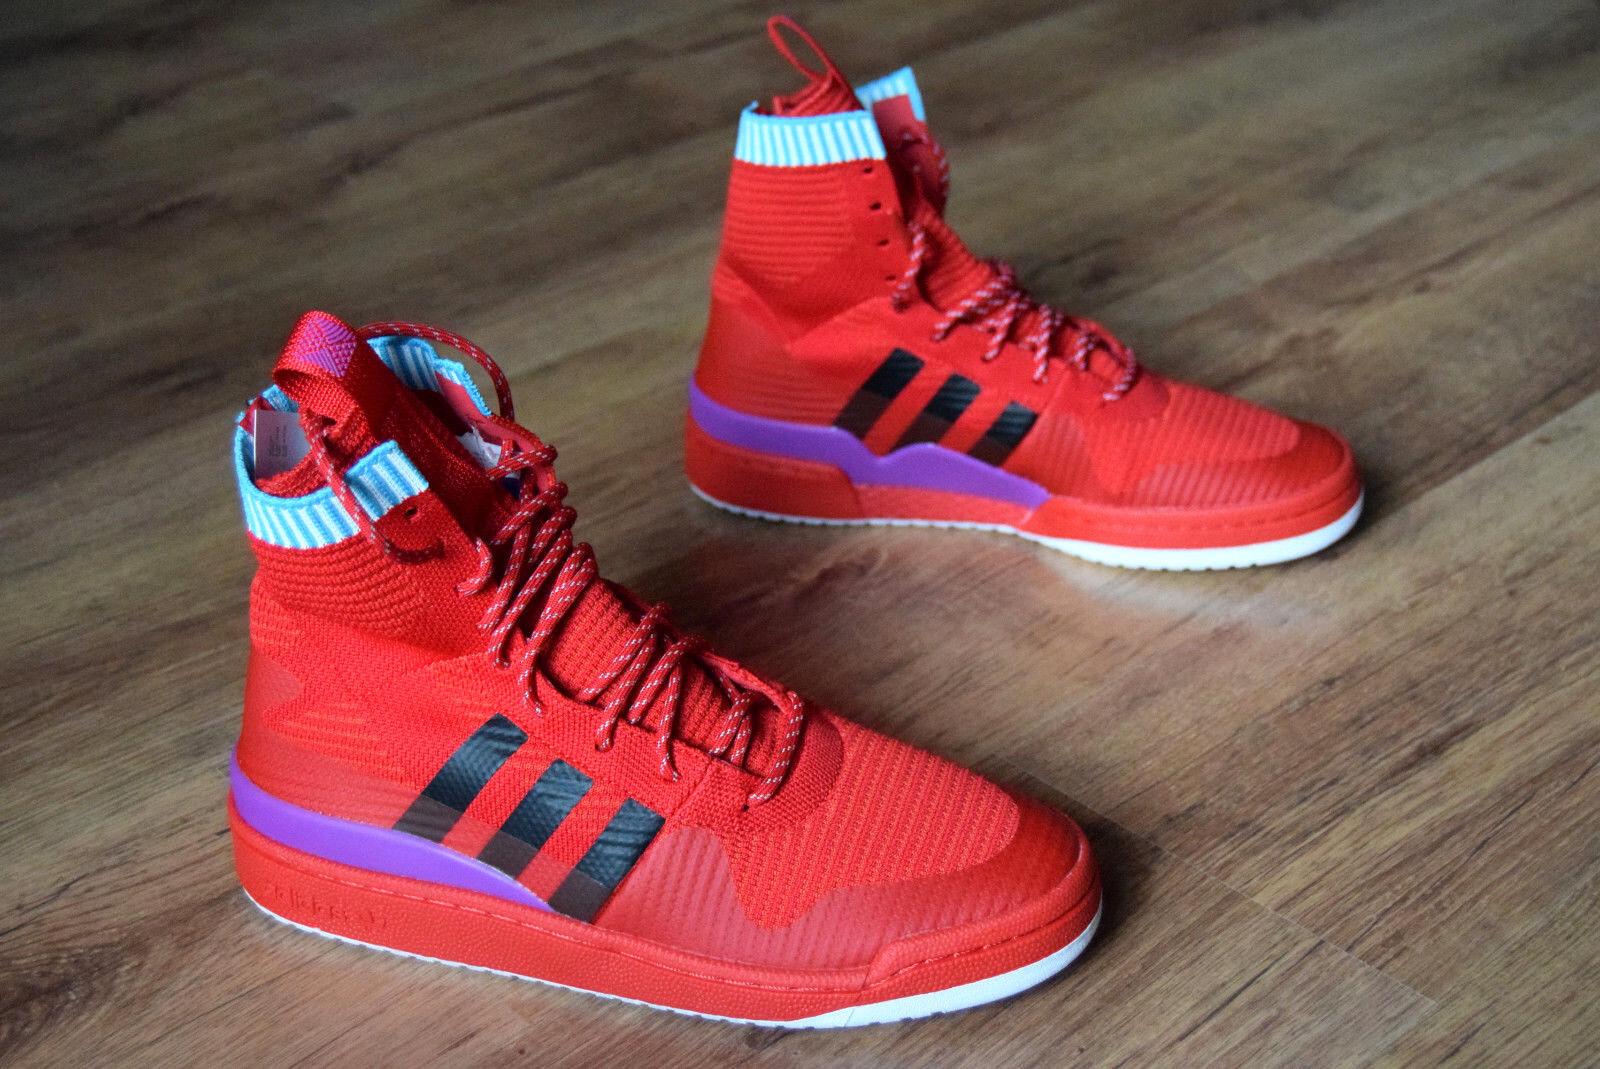 Adidas Forum Winter PK 36 37 41 42 43 44 45 46 48 BZ0645 nmd Turnschuhe Stiefel